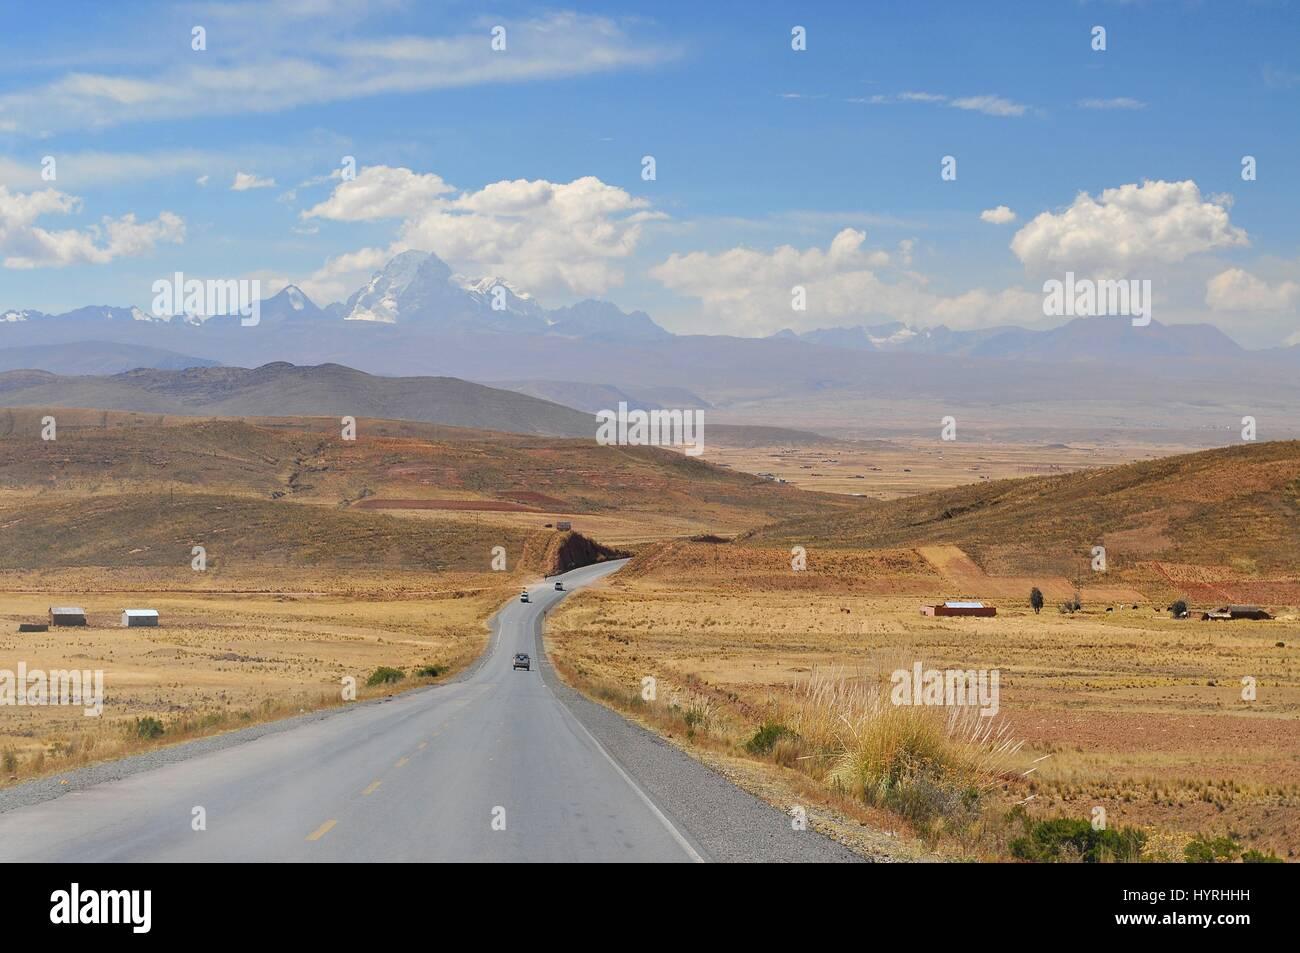 Bolivia, Cordillera Real from the Road to La Paz - Stock Image